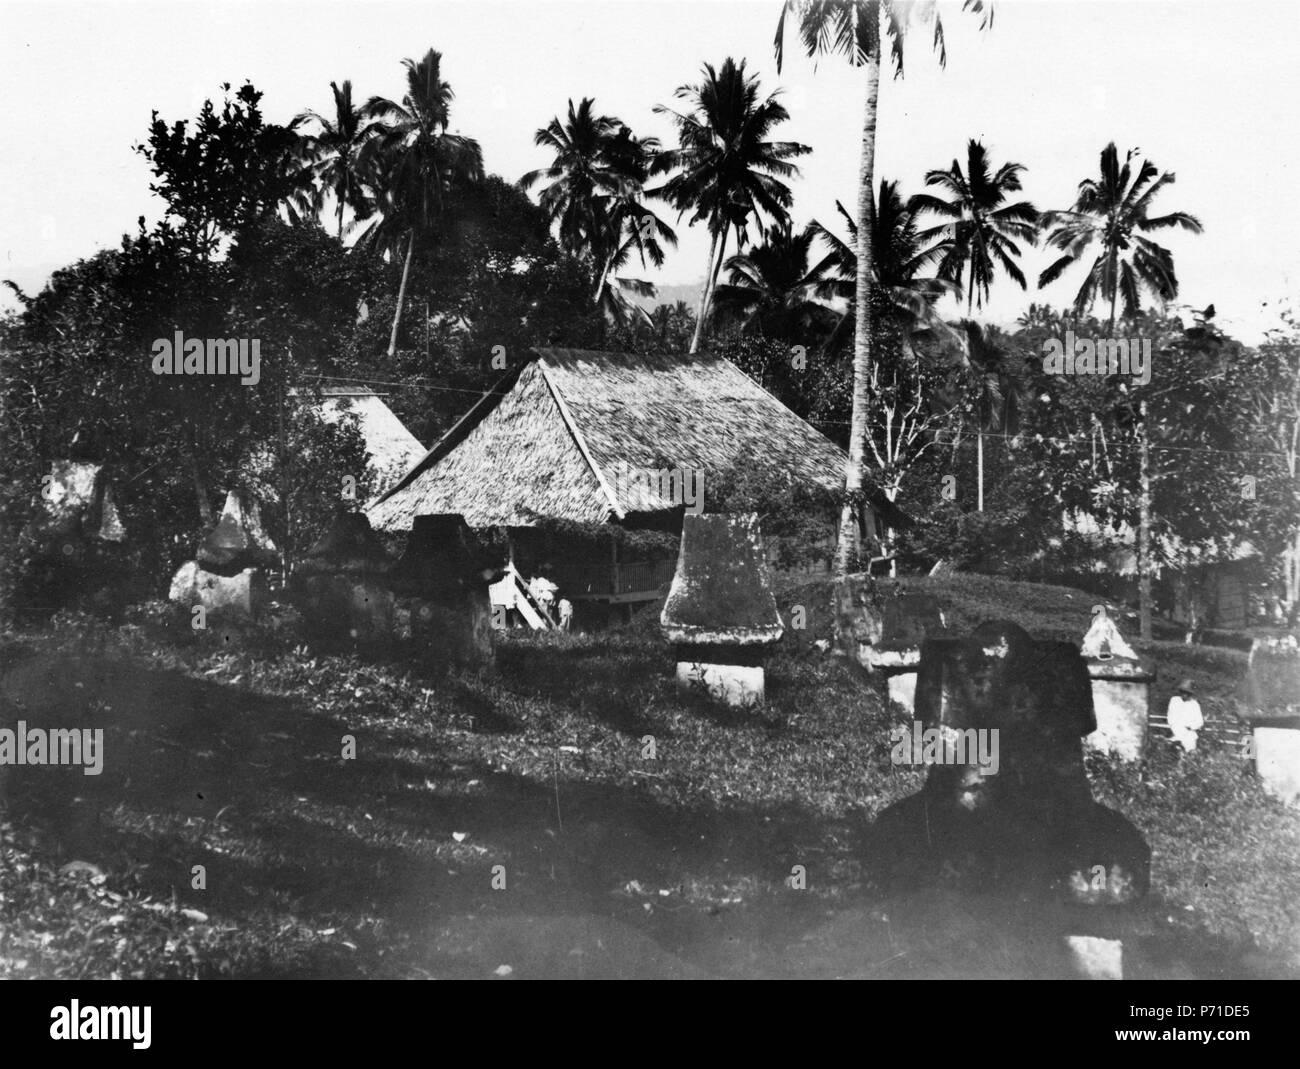 52 Stengravar. Sulawesi. Indonesien - SMVK - 010688 - Stock Image